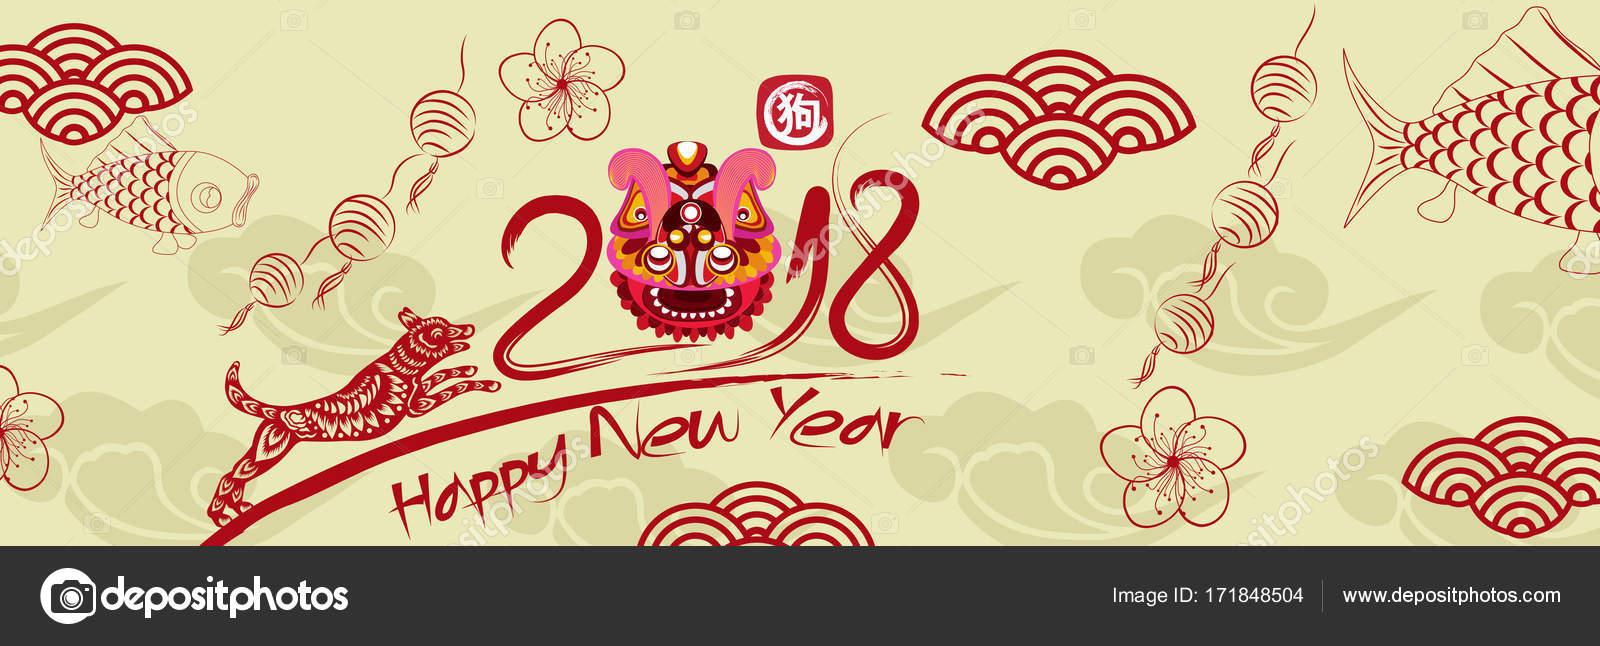 happy new year 2018 zodiac dog lunar new year stock vector